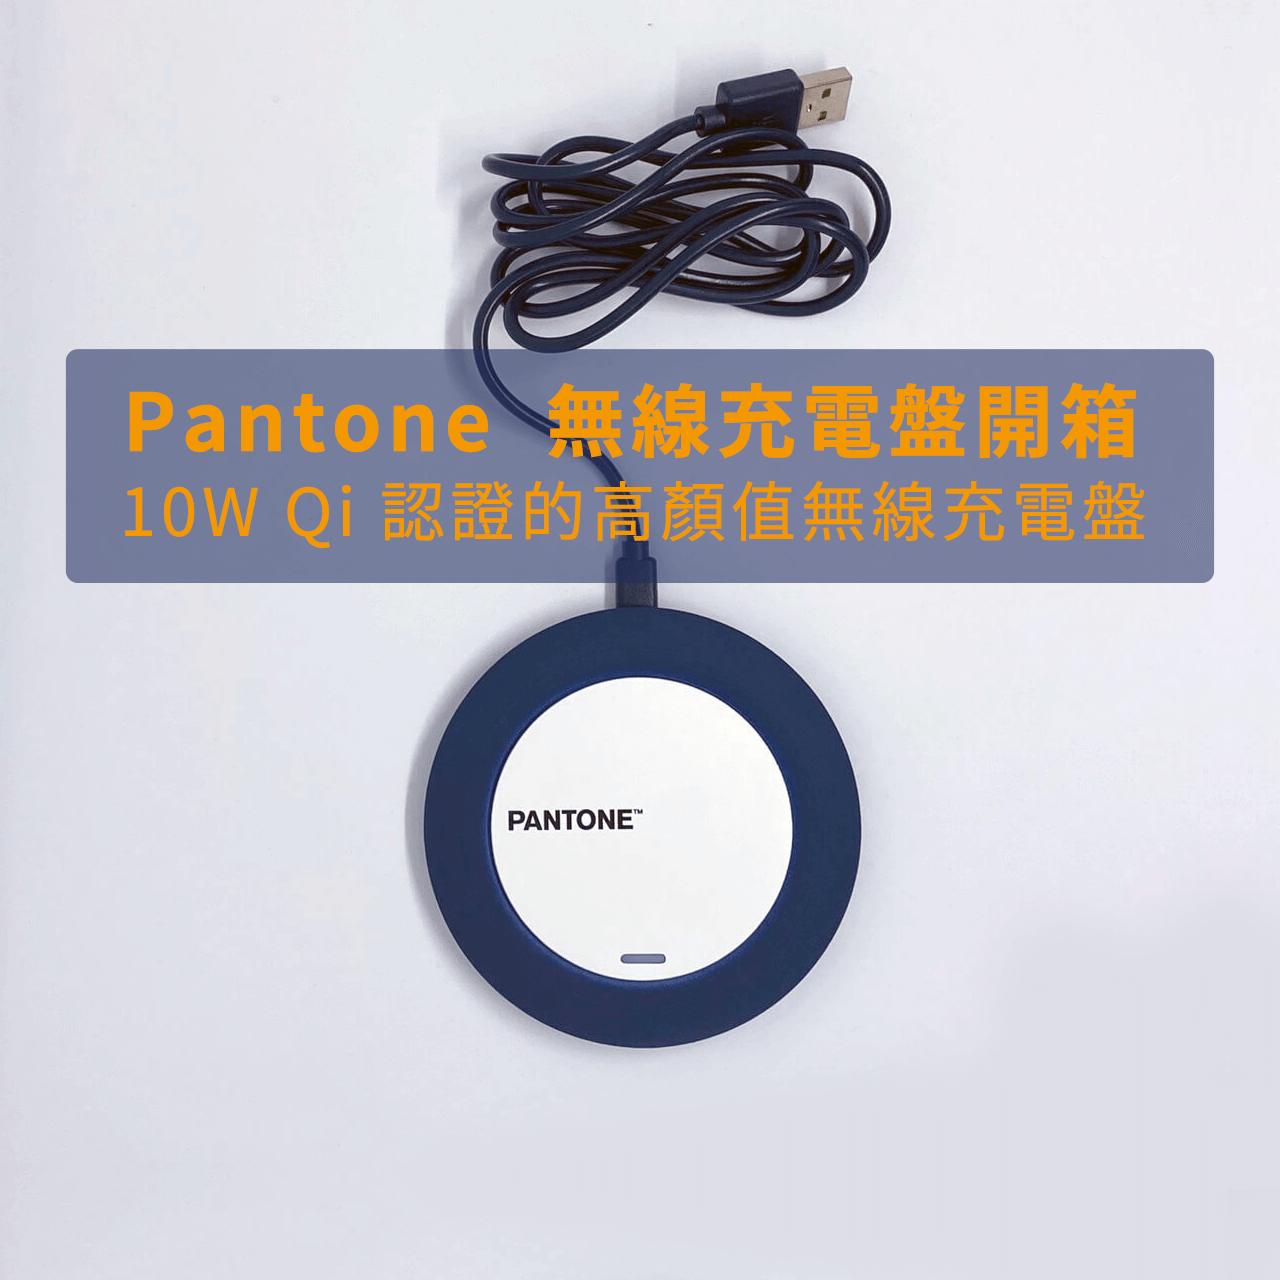 Pantone  無線充電盤開箱 10W 高顏值無線充電盤 Qi 認證